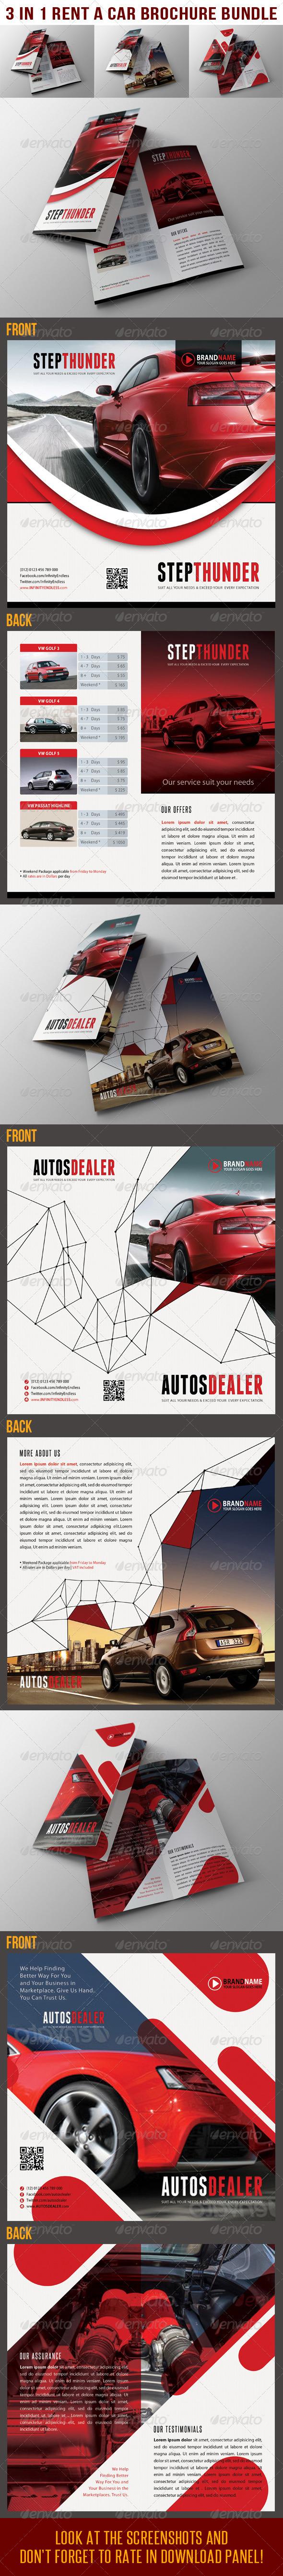 3 in 1 Rent A Car BiFold Brochure Bundle 02 - Catalogs Brochures